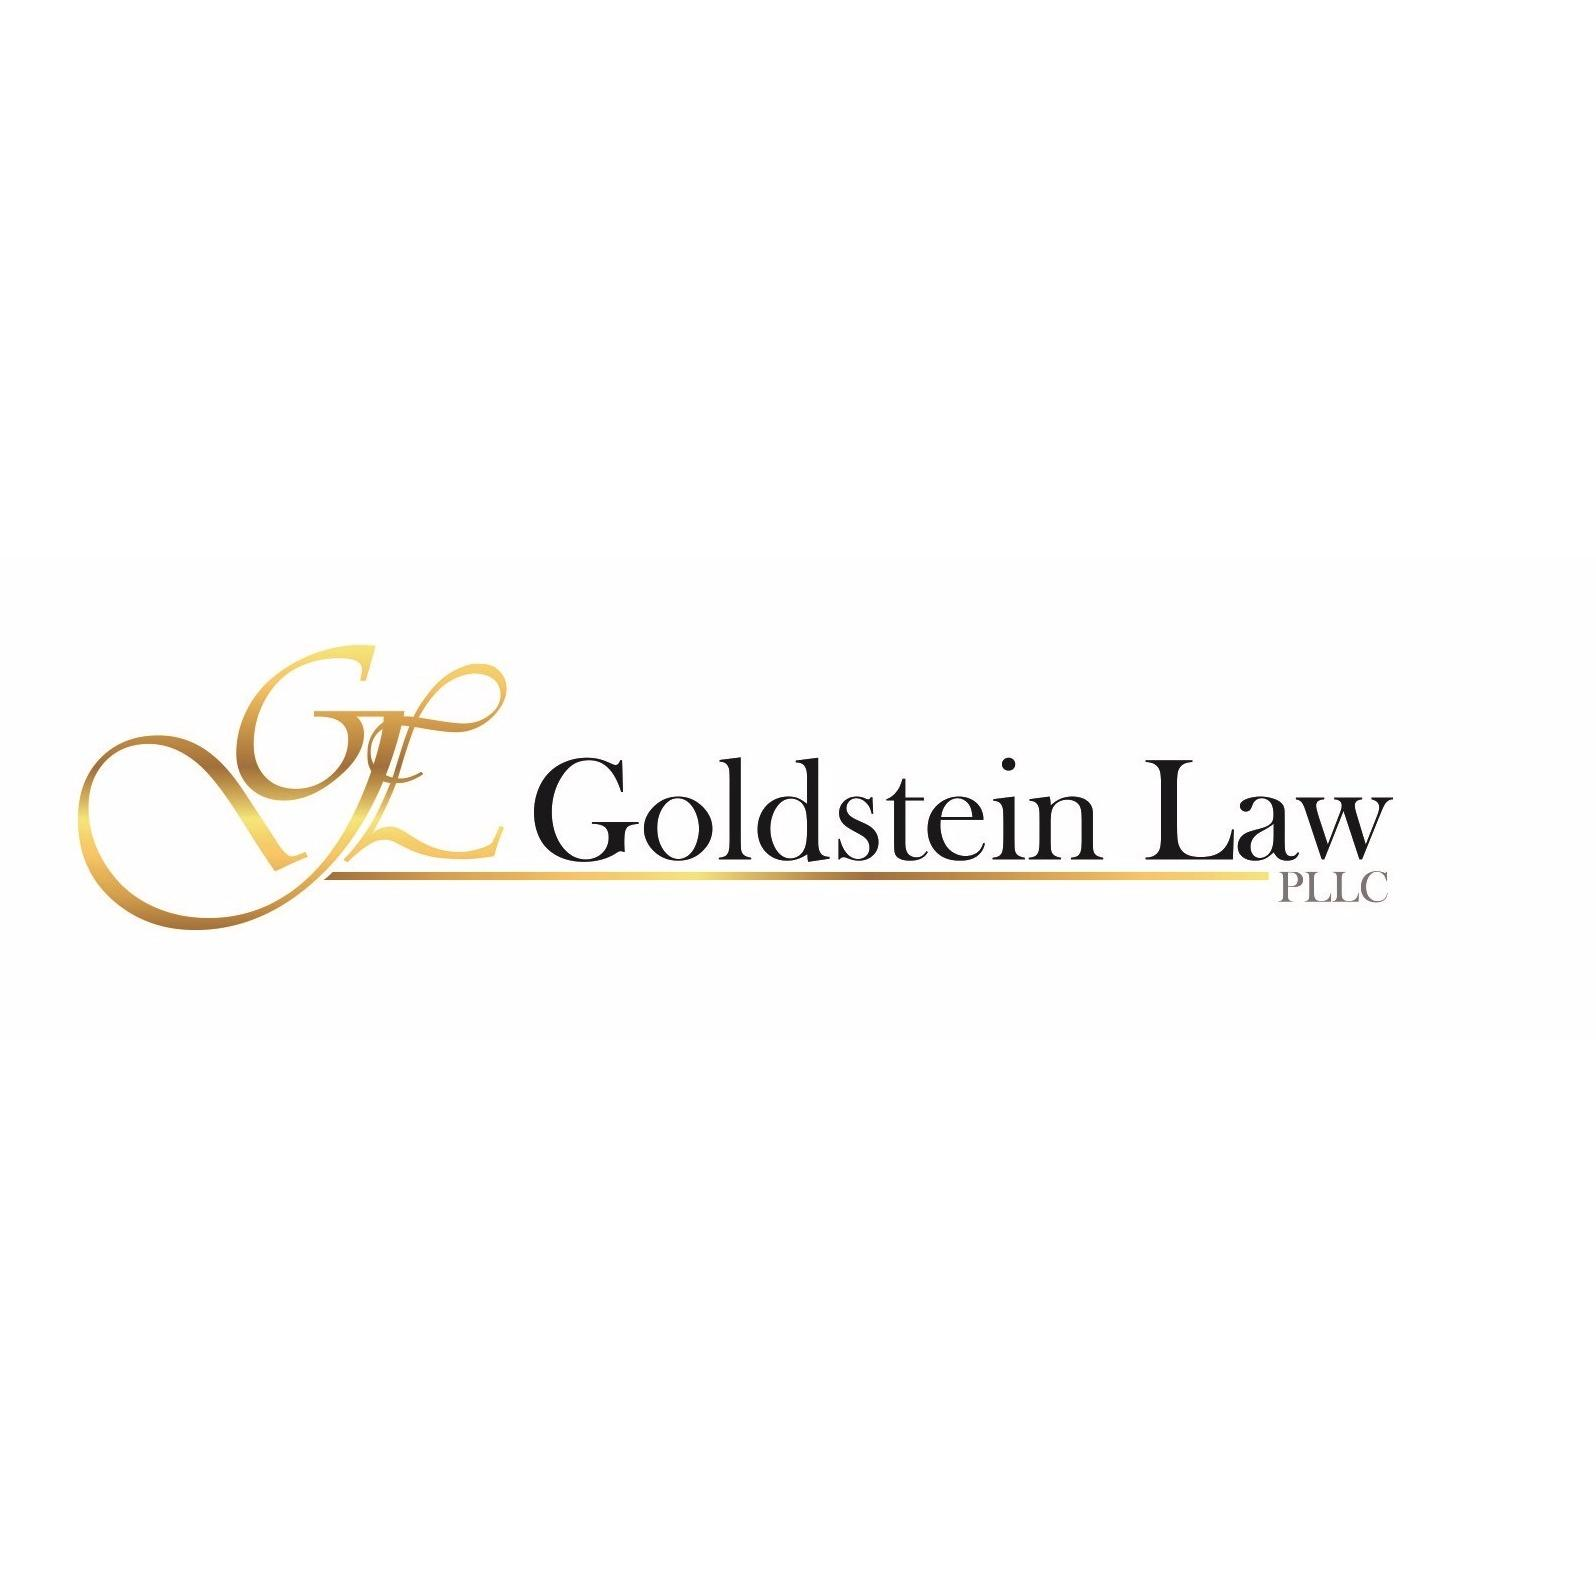 Goldstein Law, PLLC